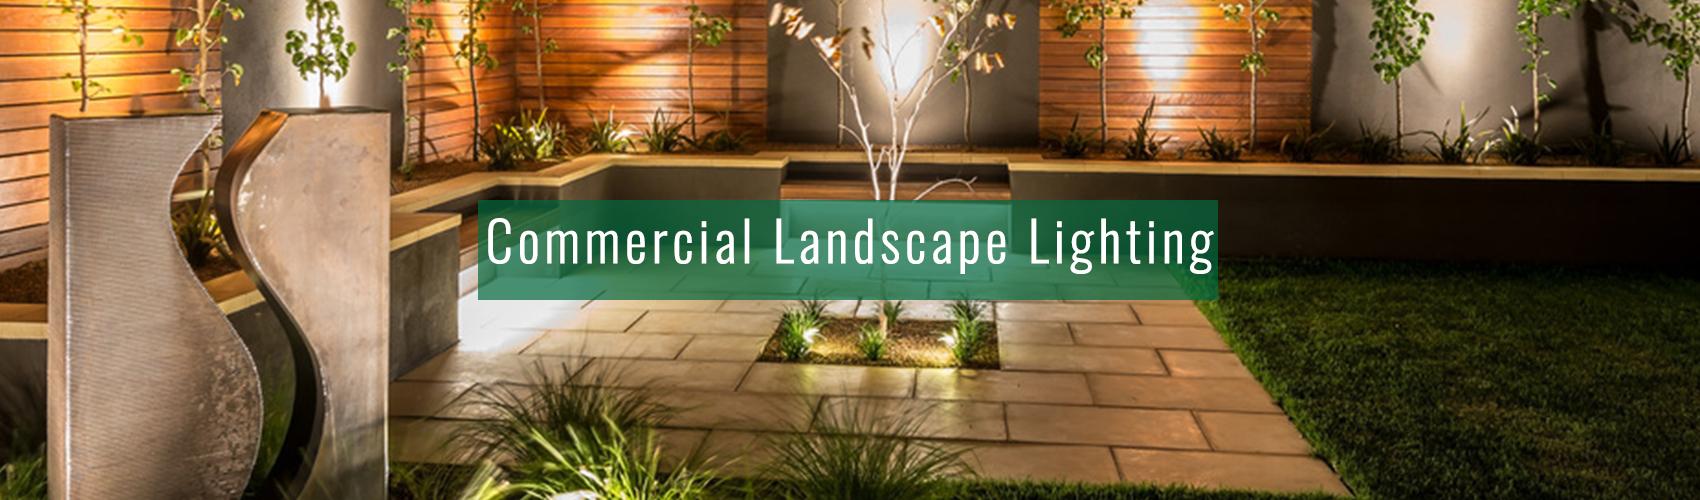 Commercial Landscape Lighting at Complete Landscaping Service